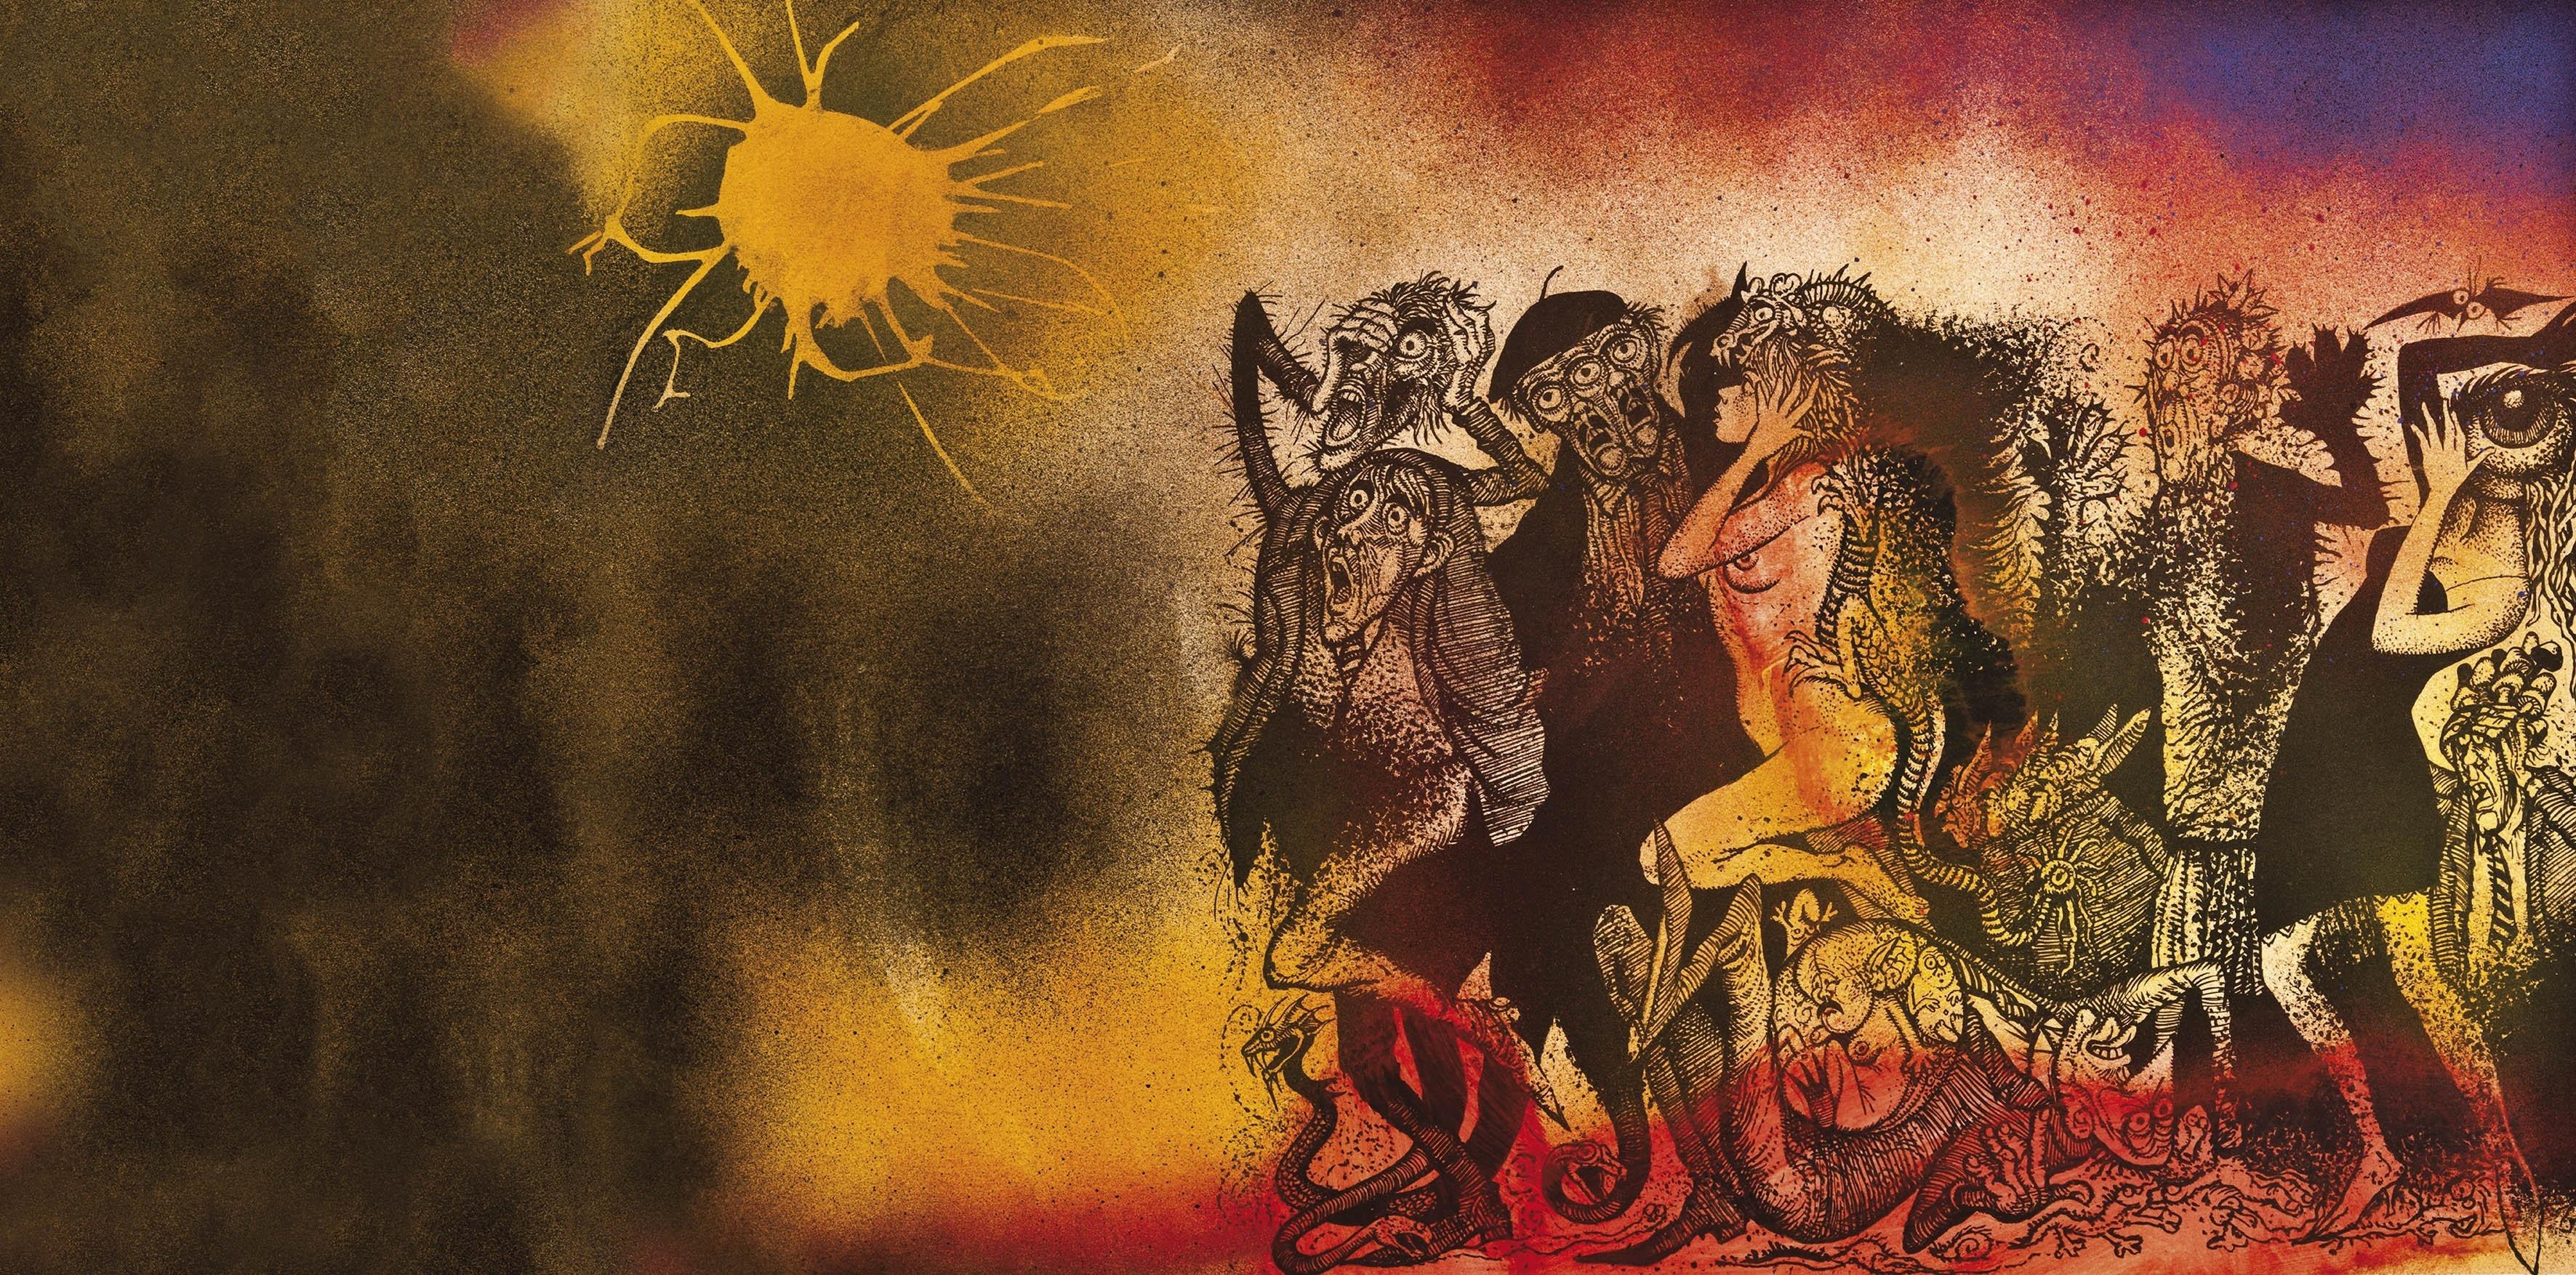 Download Wallpapers Download 1680x1050 artwork storm 1680x1050